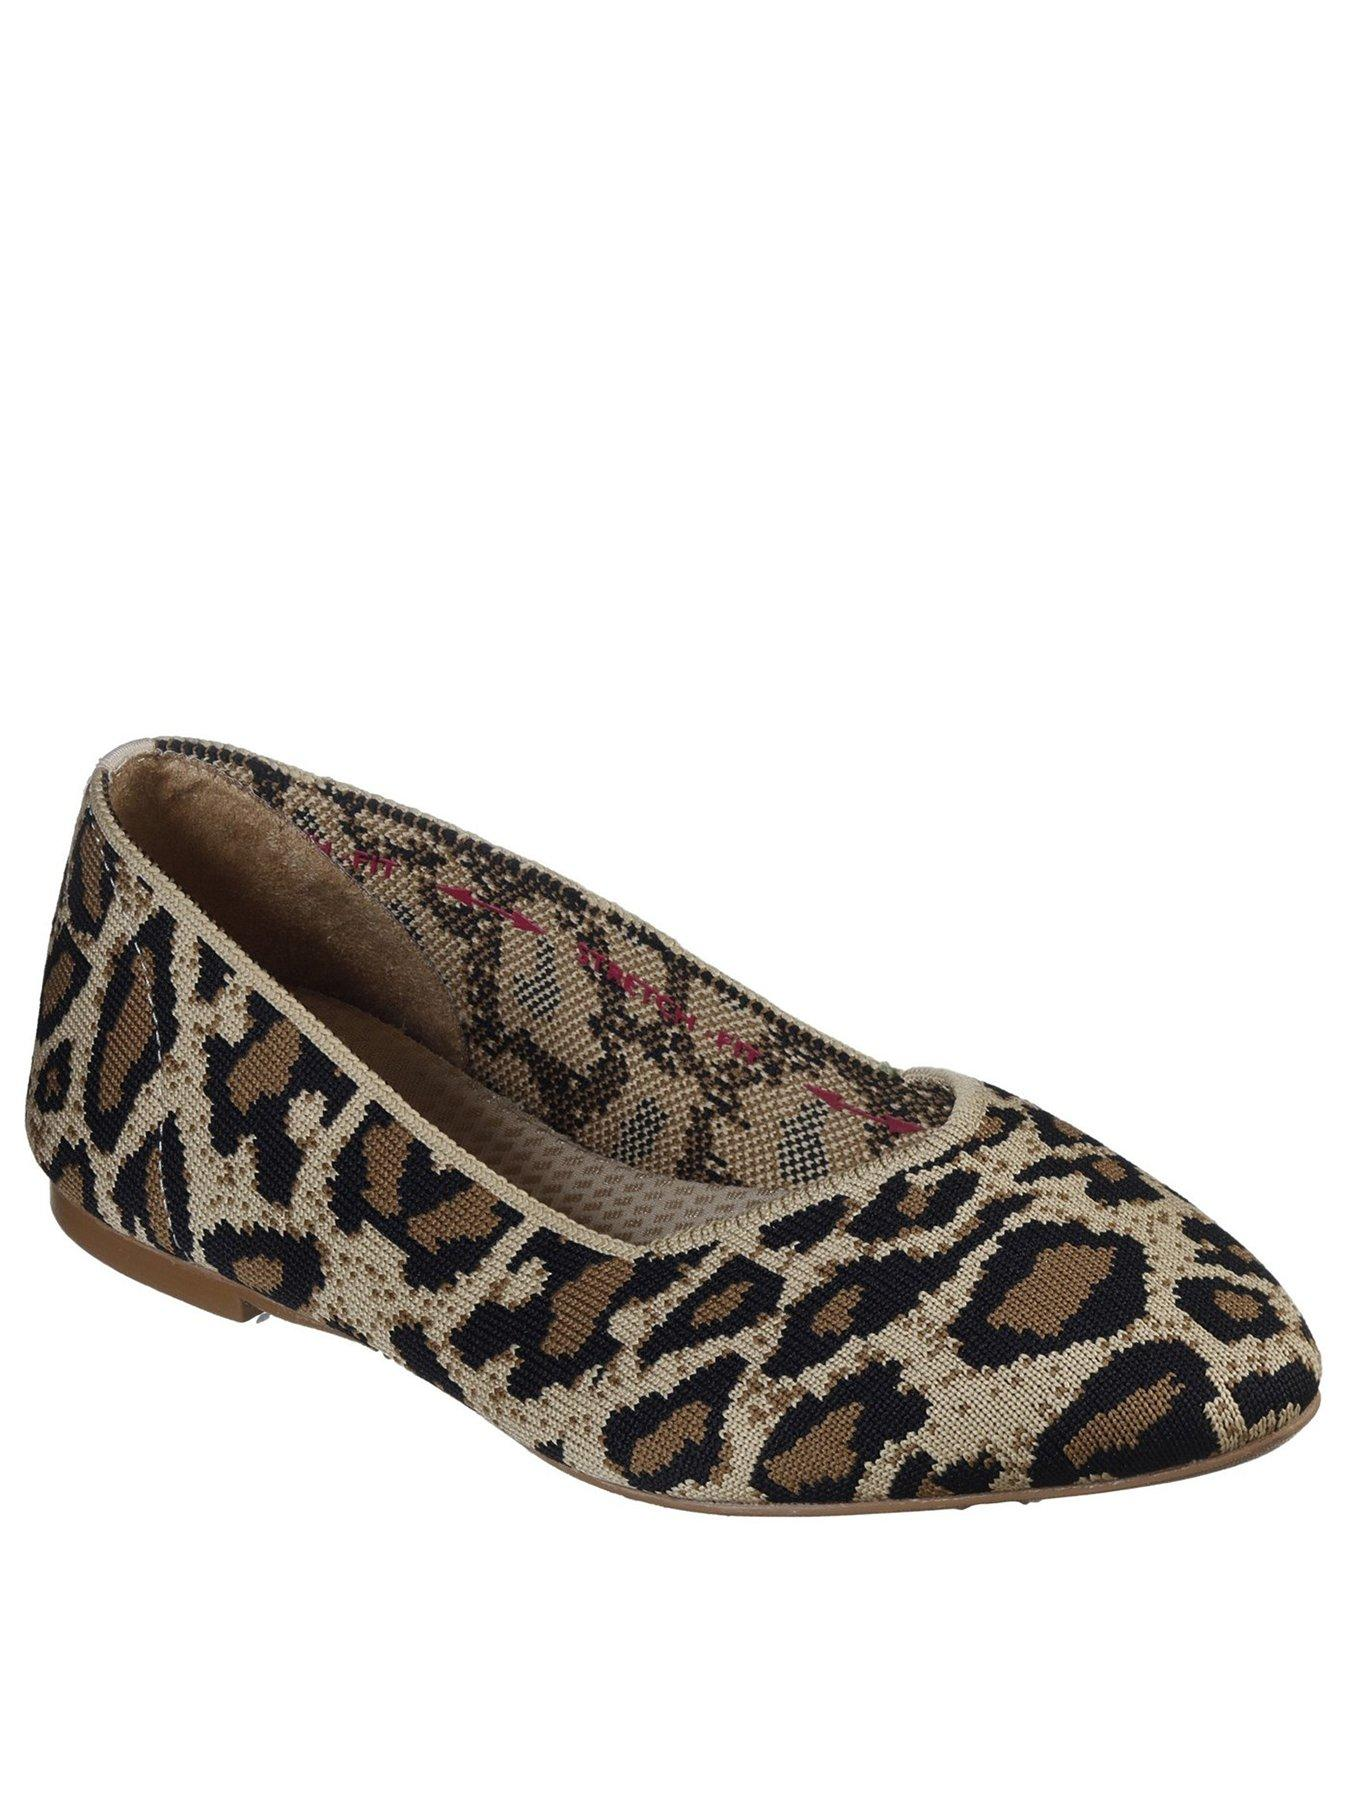 Cream | Skechers | Shoes \u0026 boots